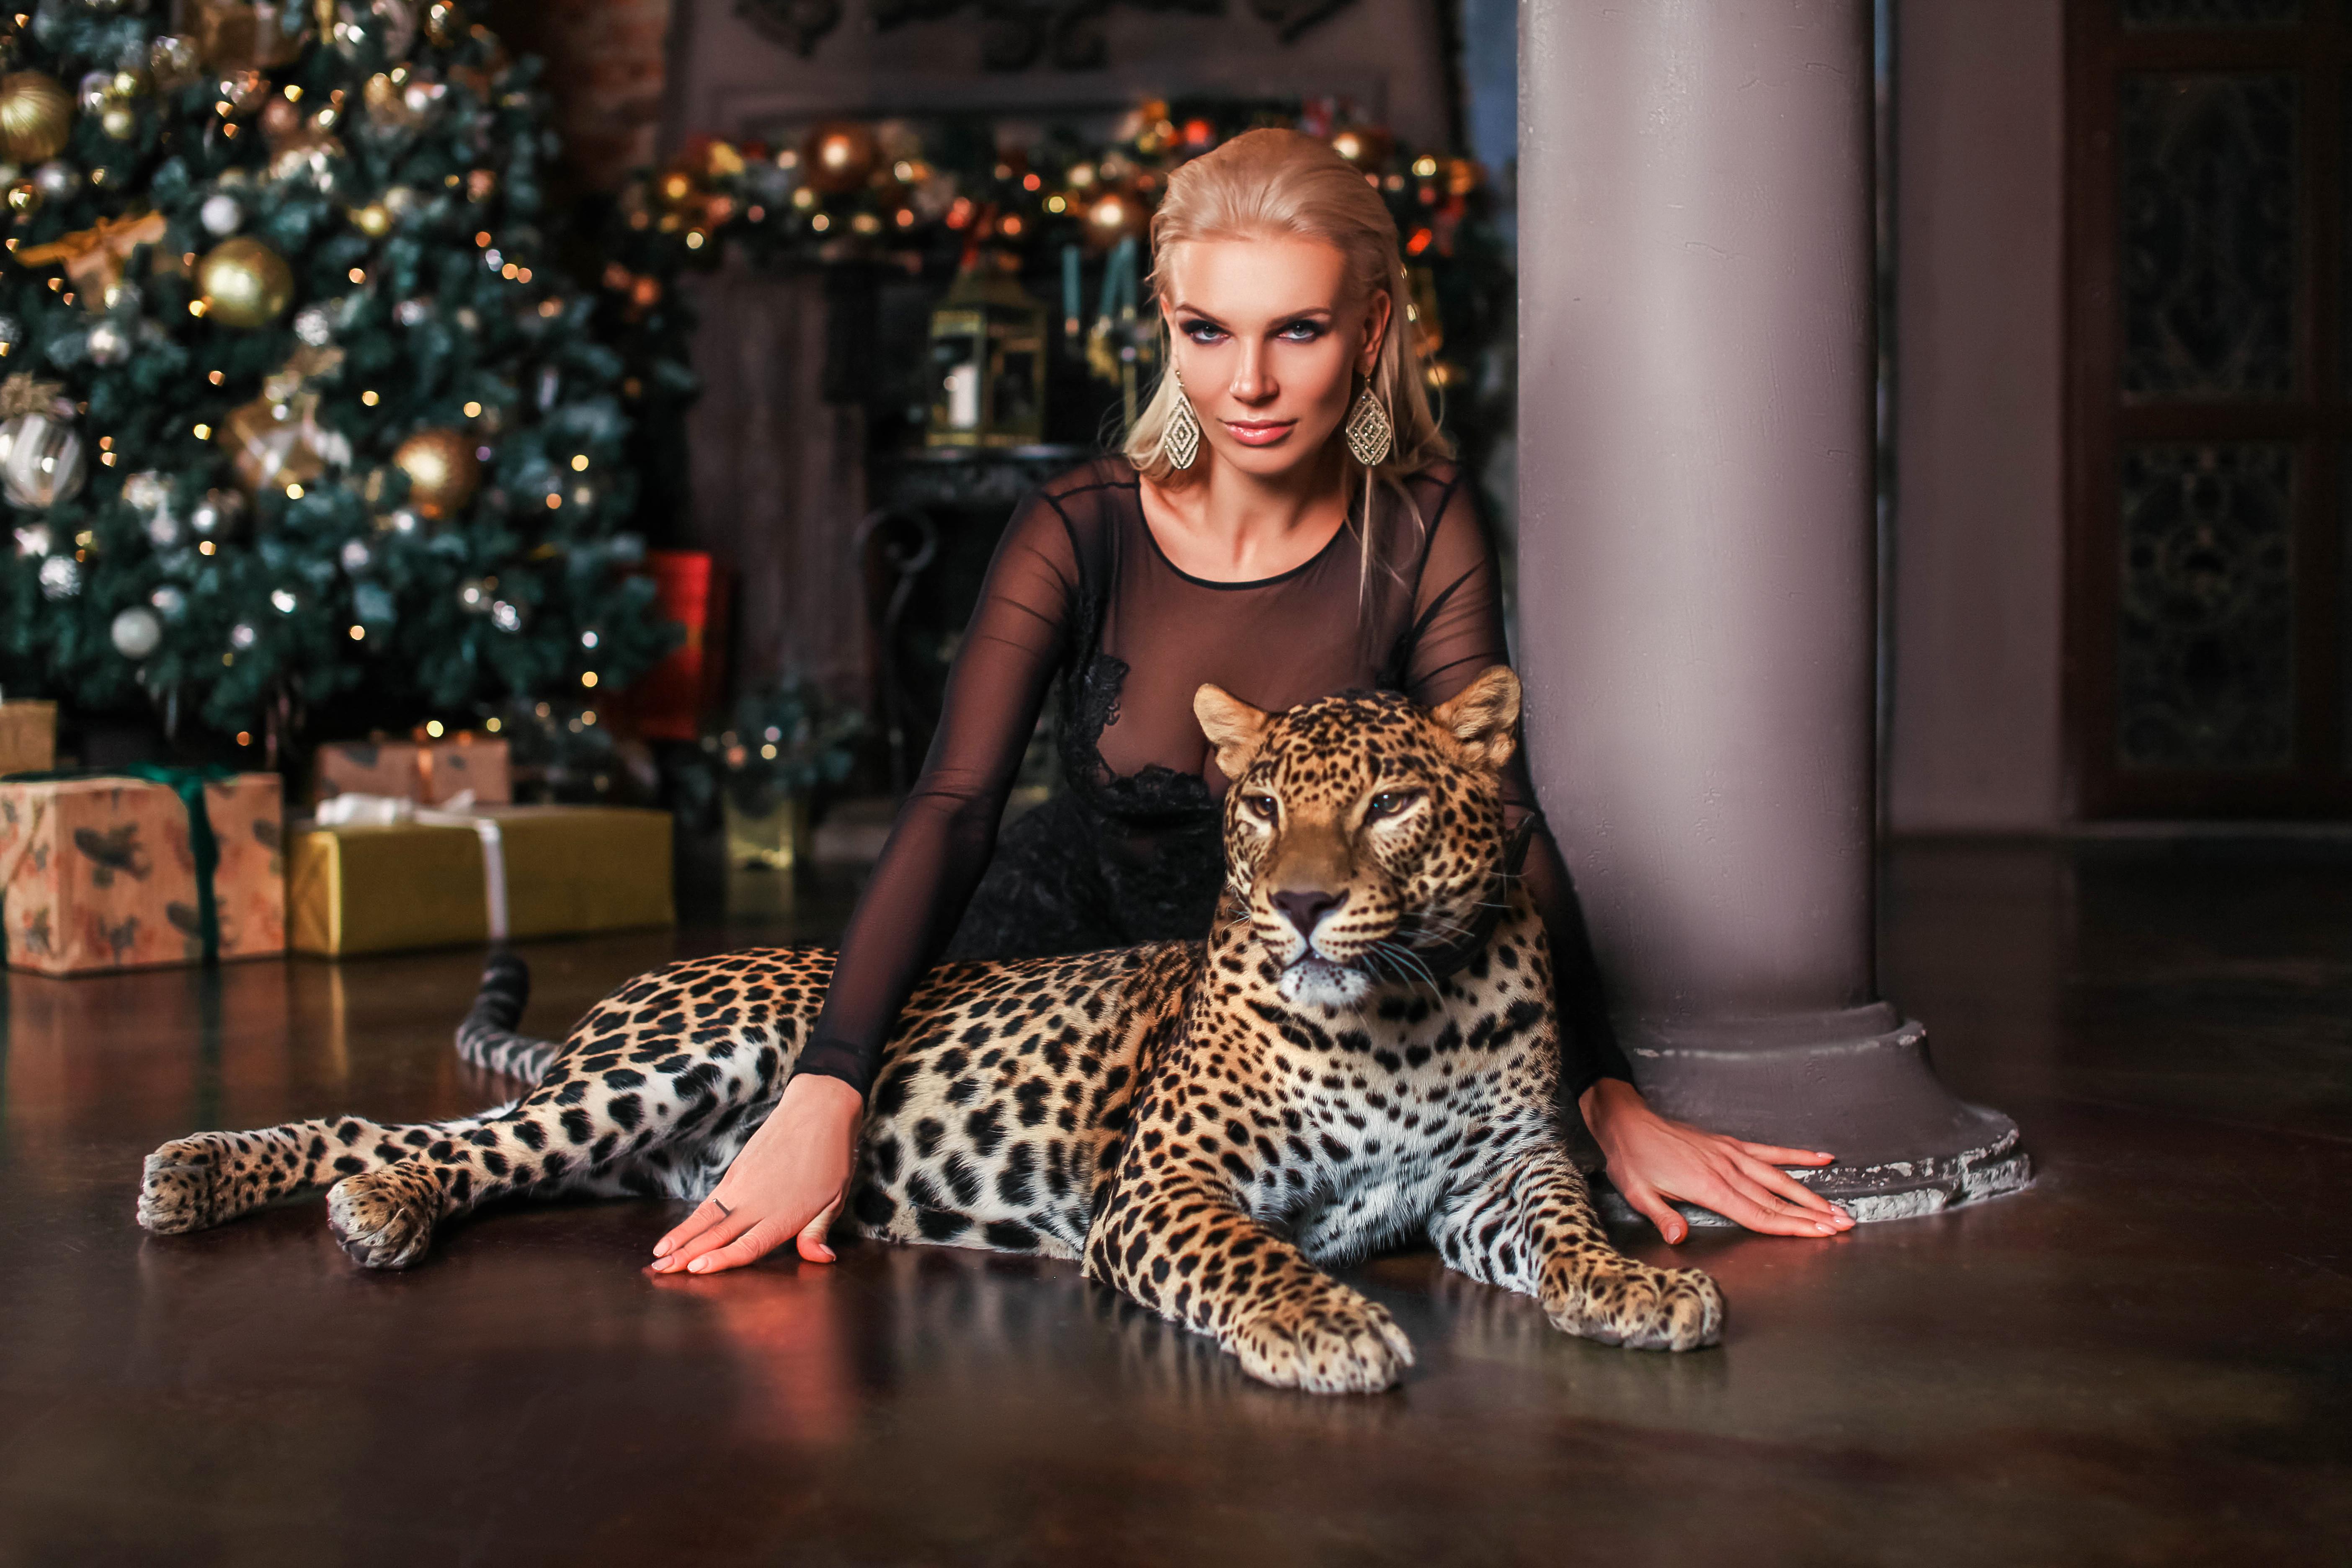 блондинка и дикий леопард